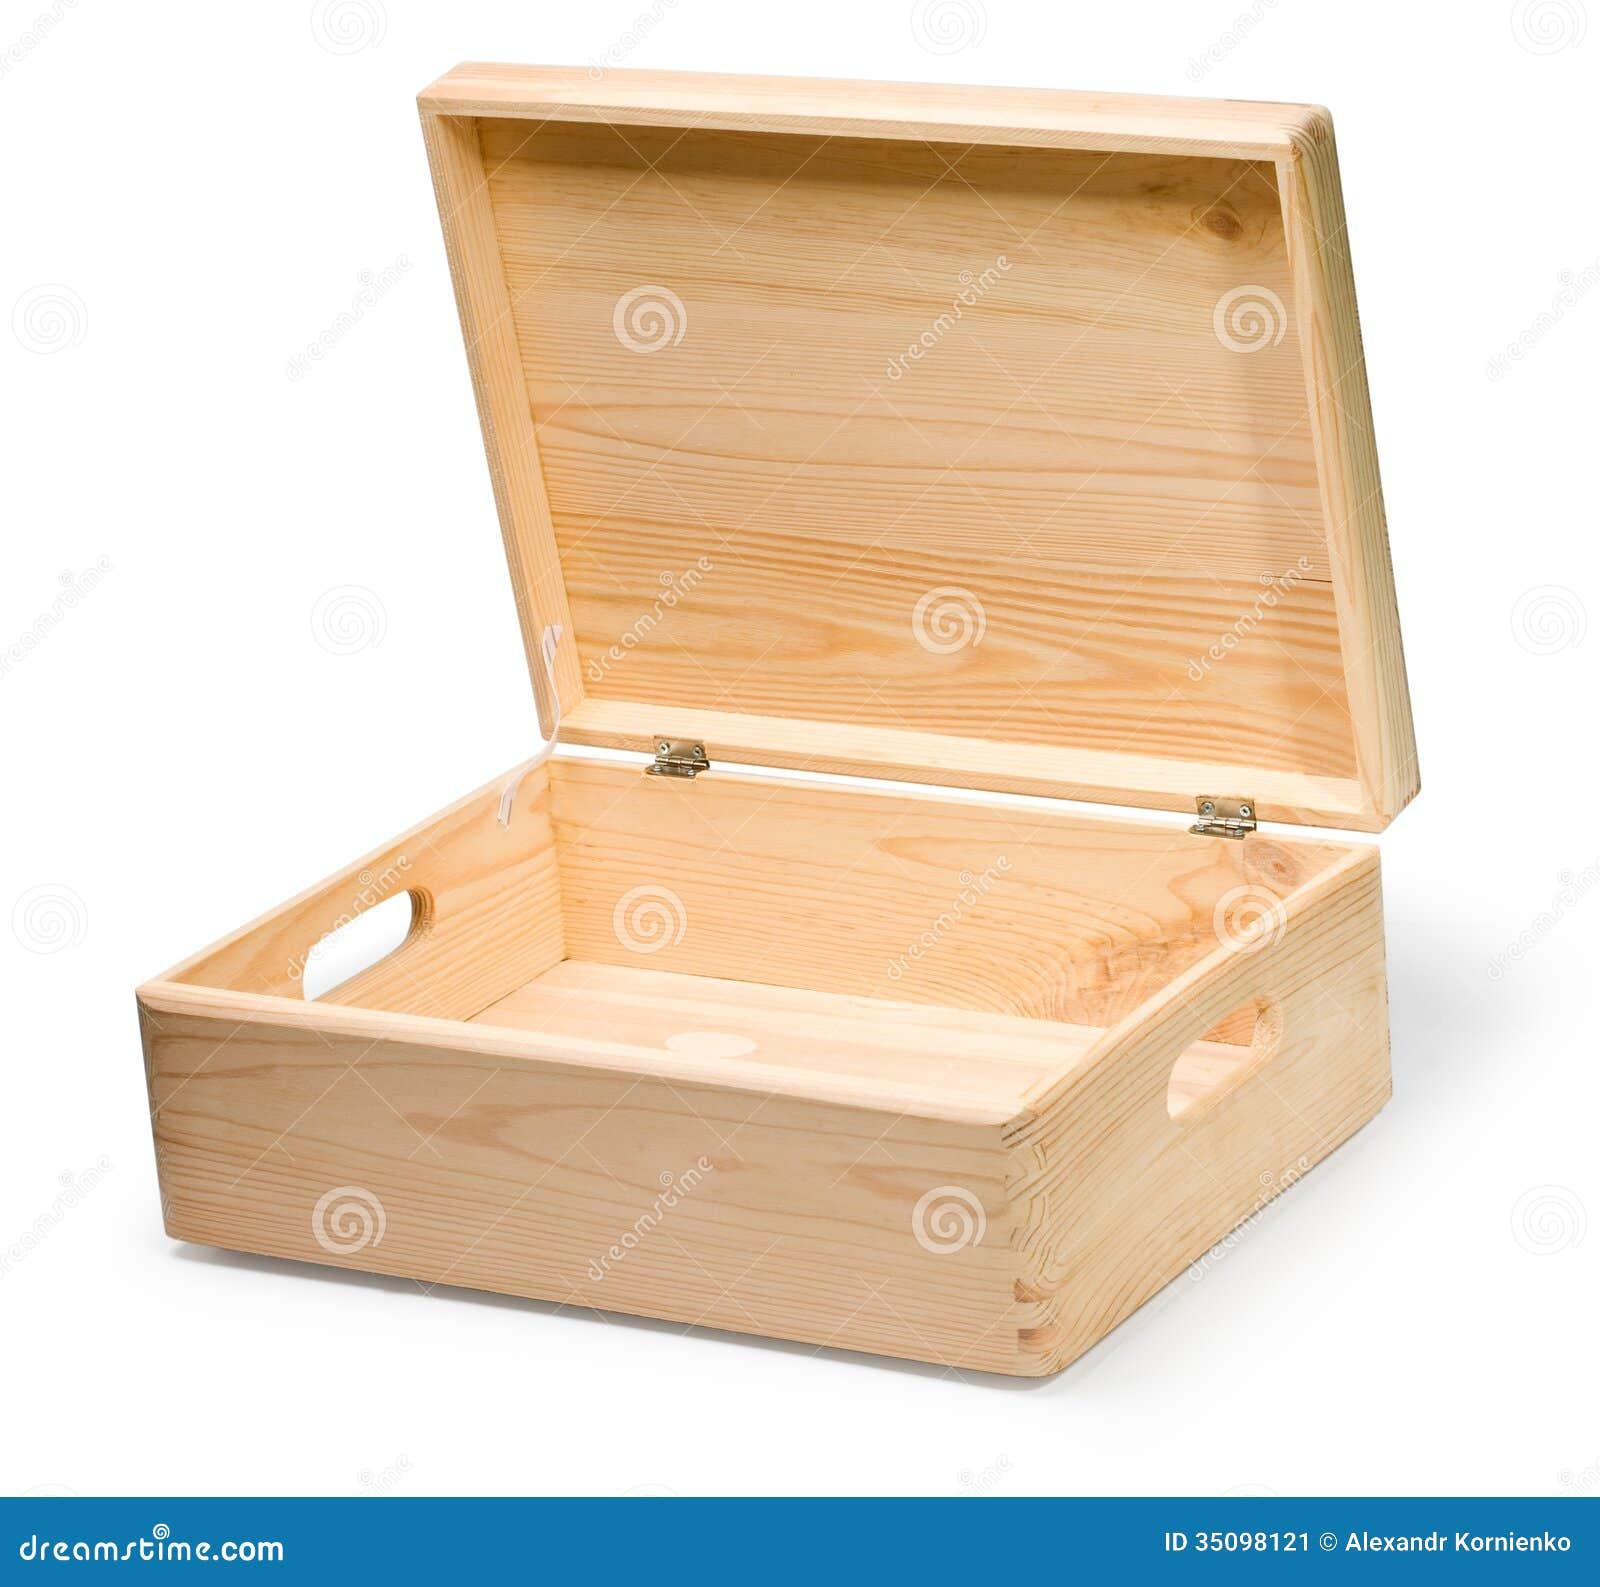 Wooden Box Stock Image Image 35098121